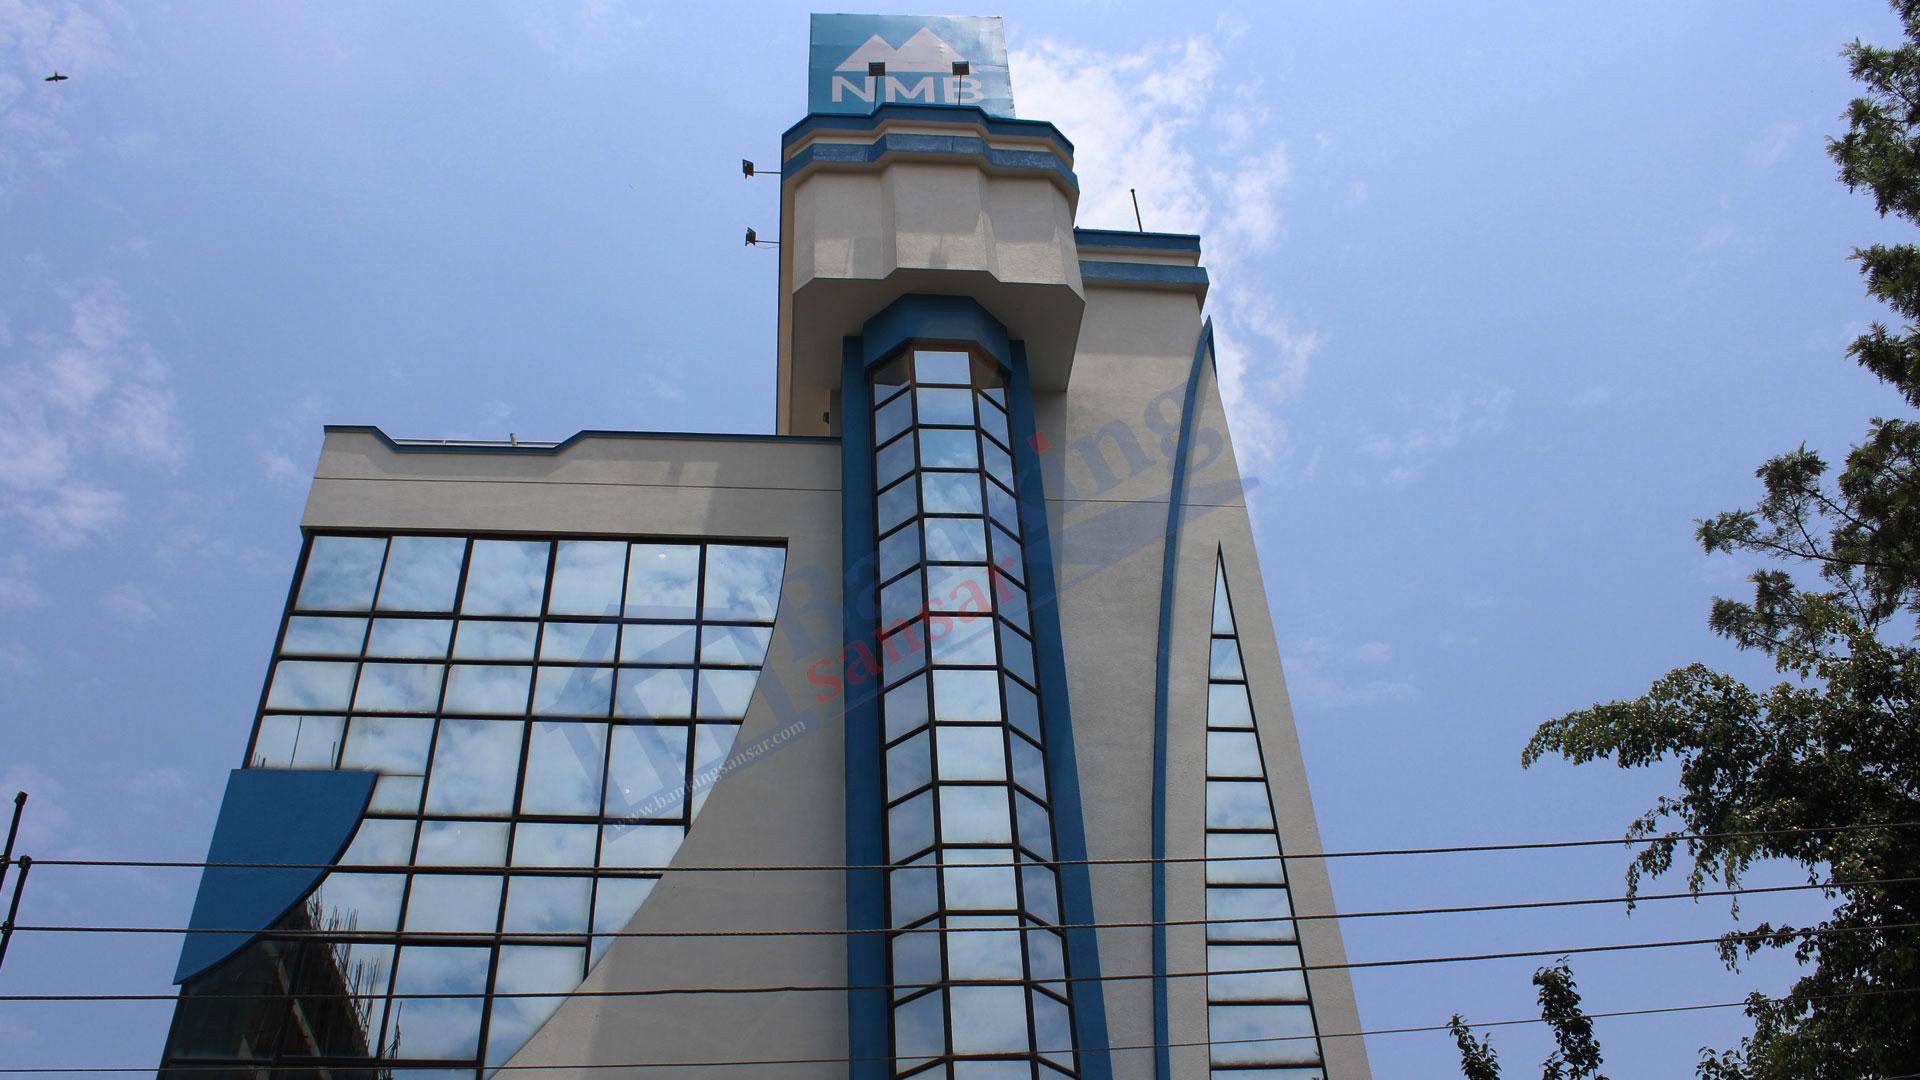 NMB Bank